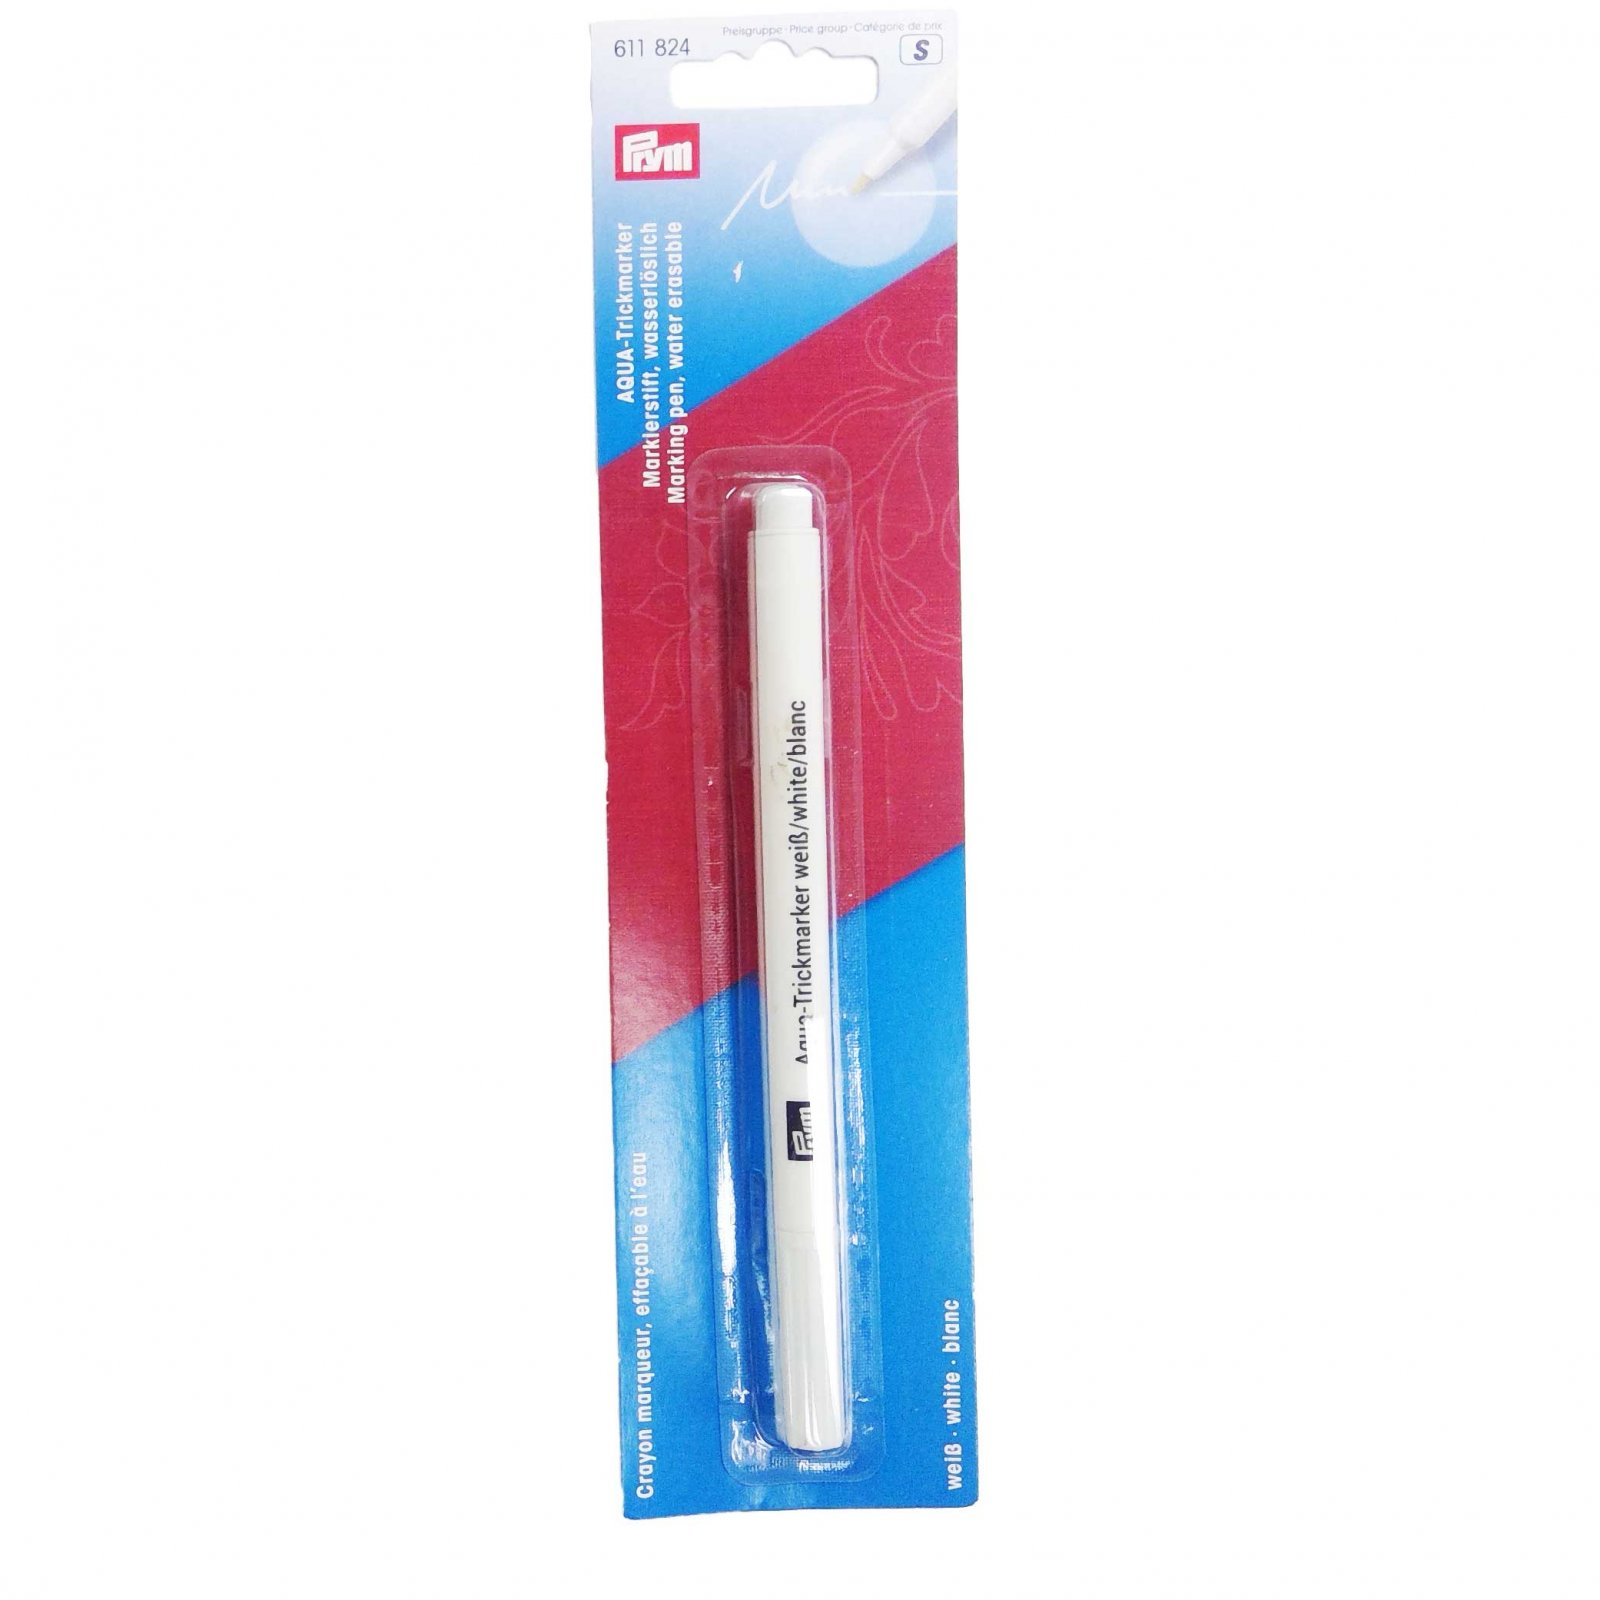 Prym Fabric Marker, Water Erasable White